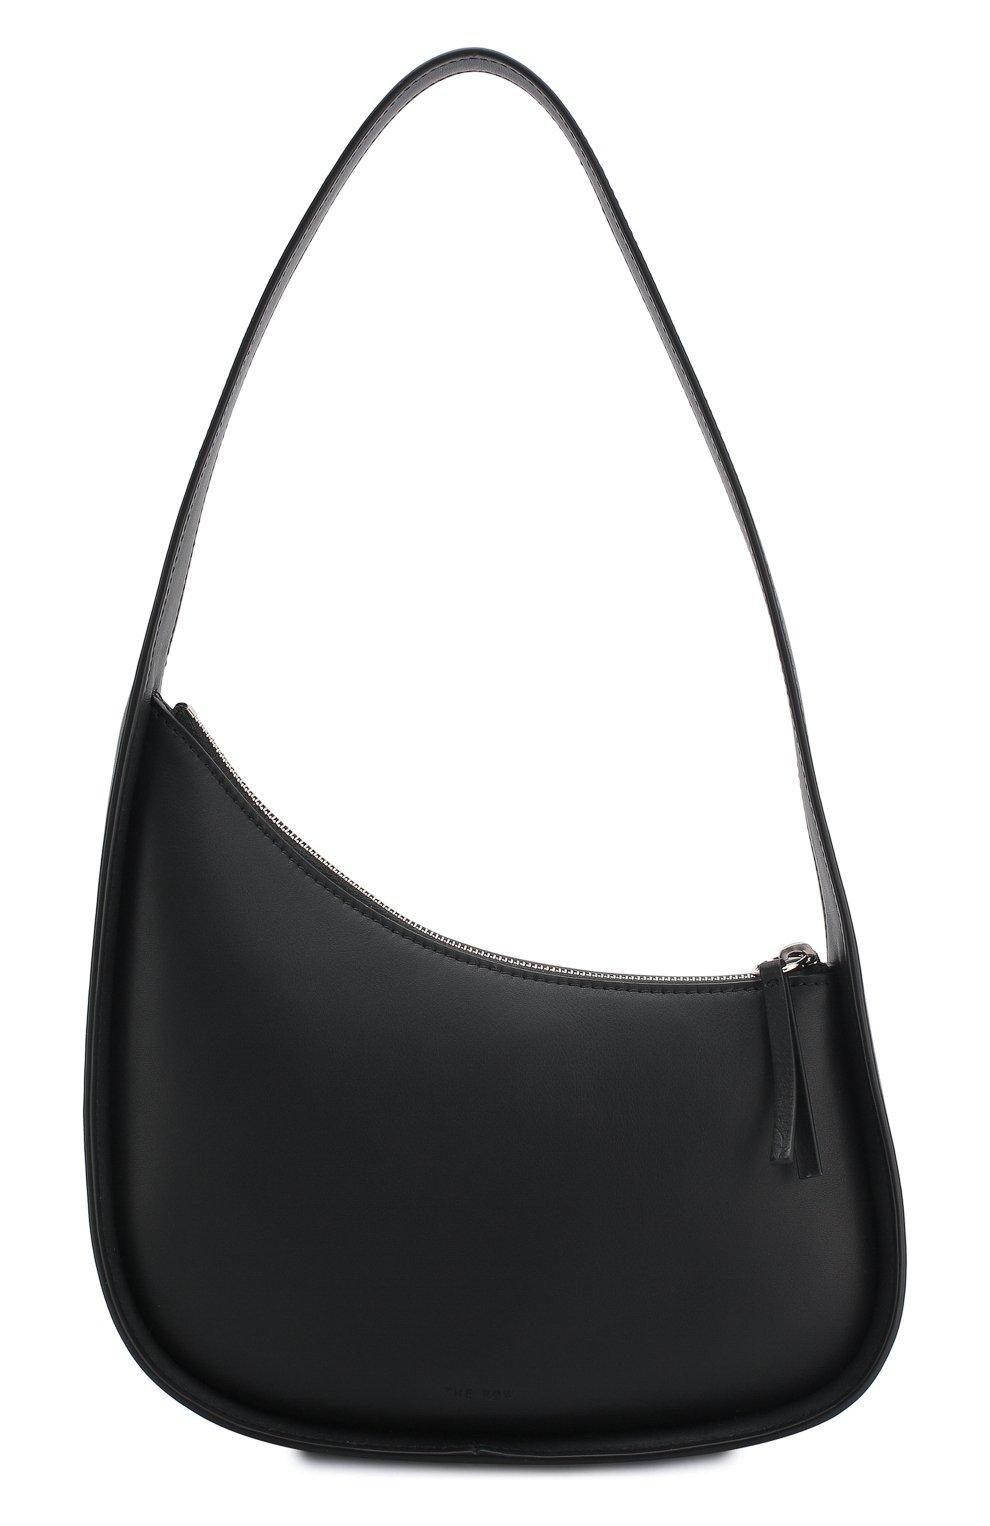 Женская сумка half moon THE ROW черного цвета, арт. W1249L52   Фото 1 (Сумки-технические: Сумки top-handle; Материал: Натуральная кожа; Размер: mini)